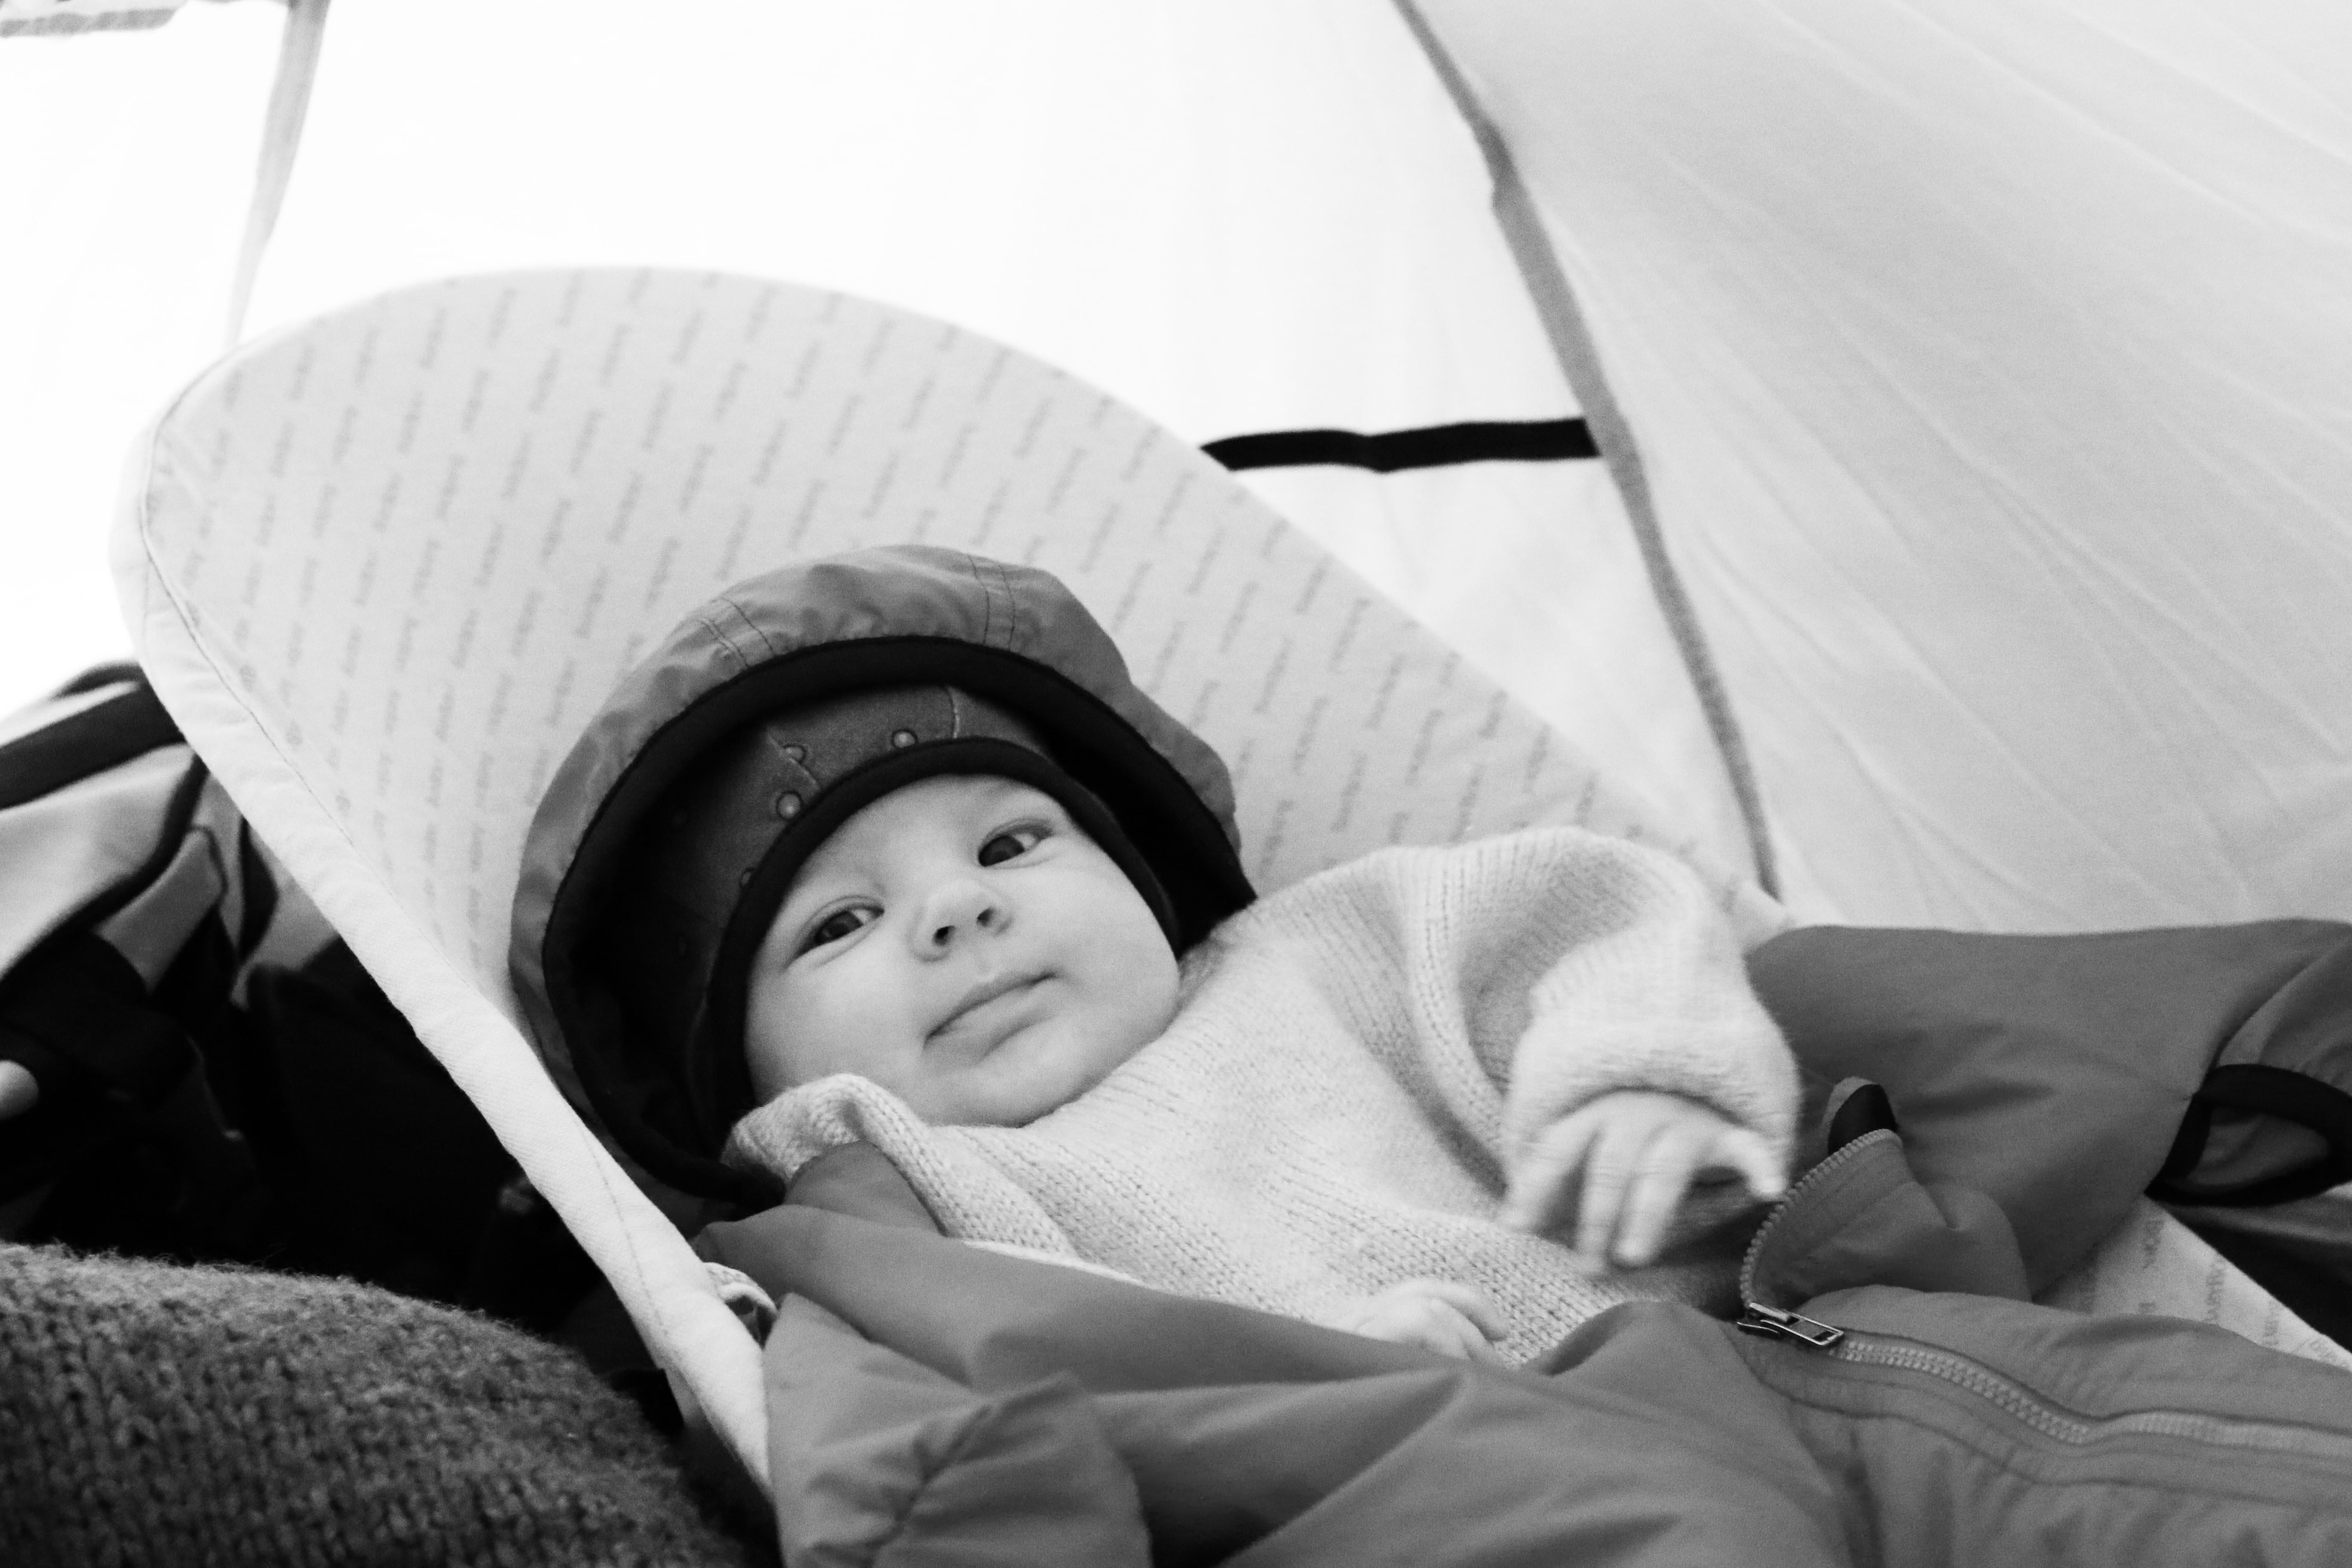 Un bébé en camping par -5°C